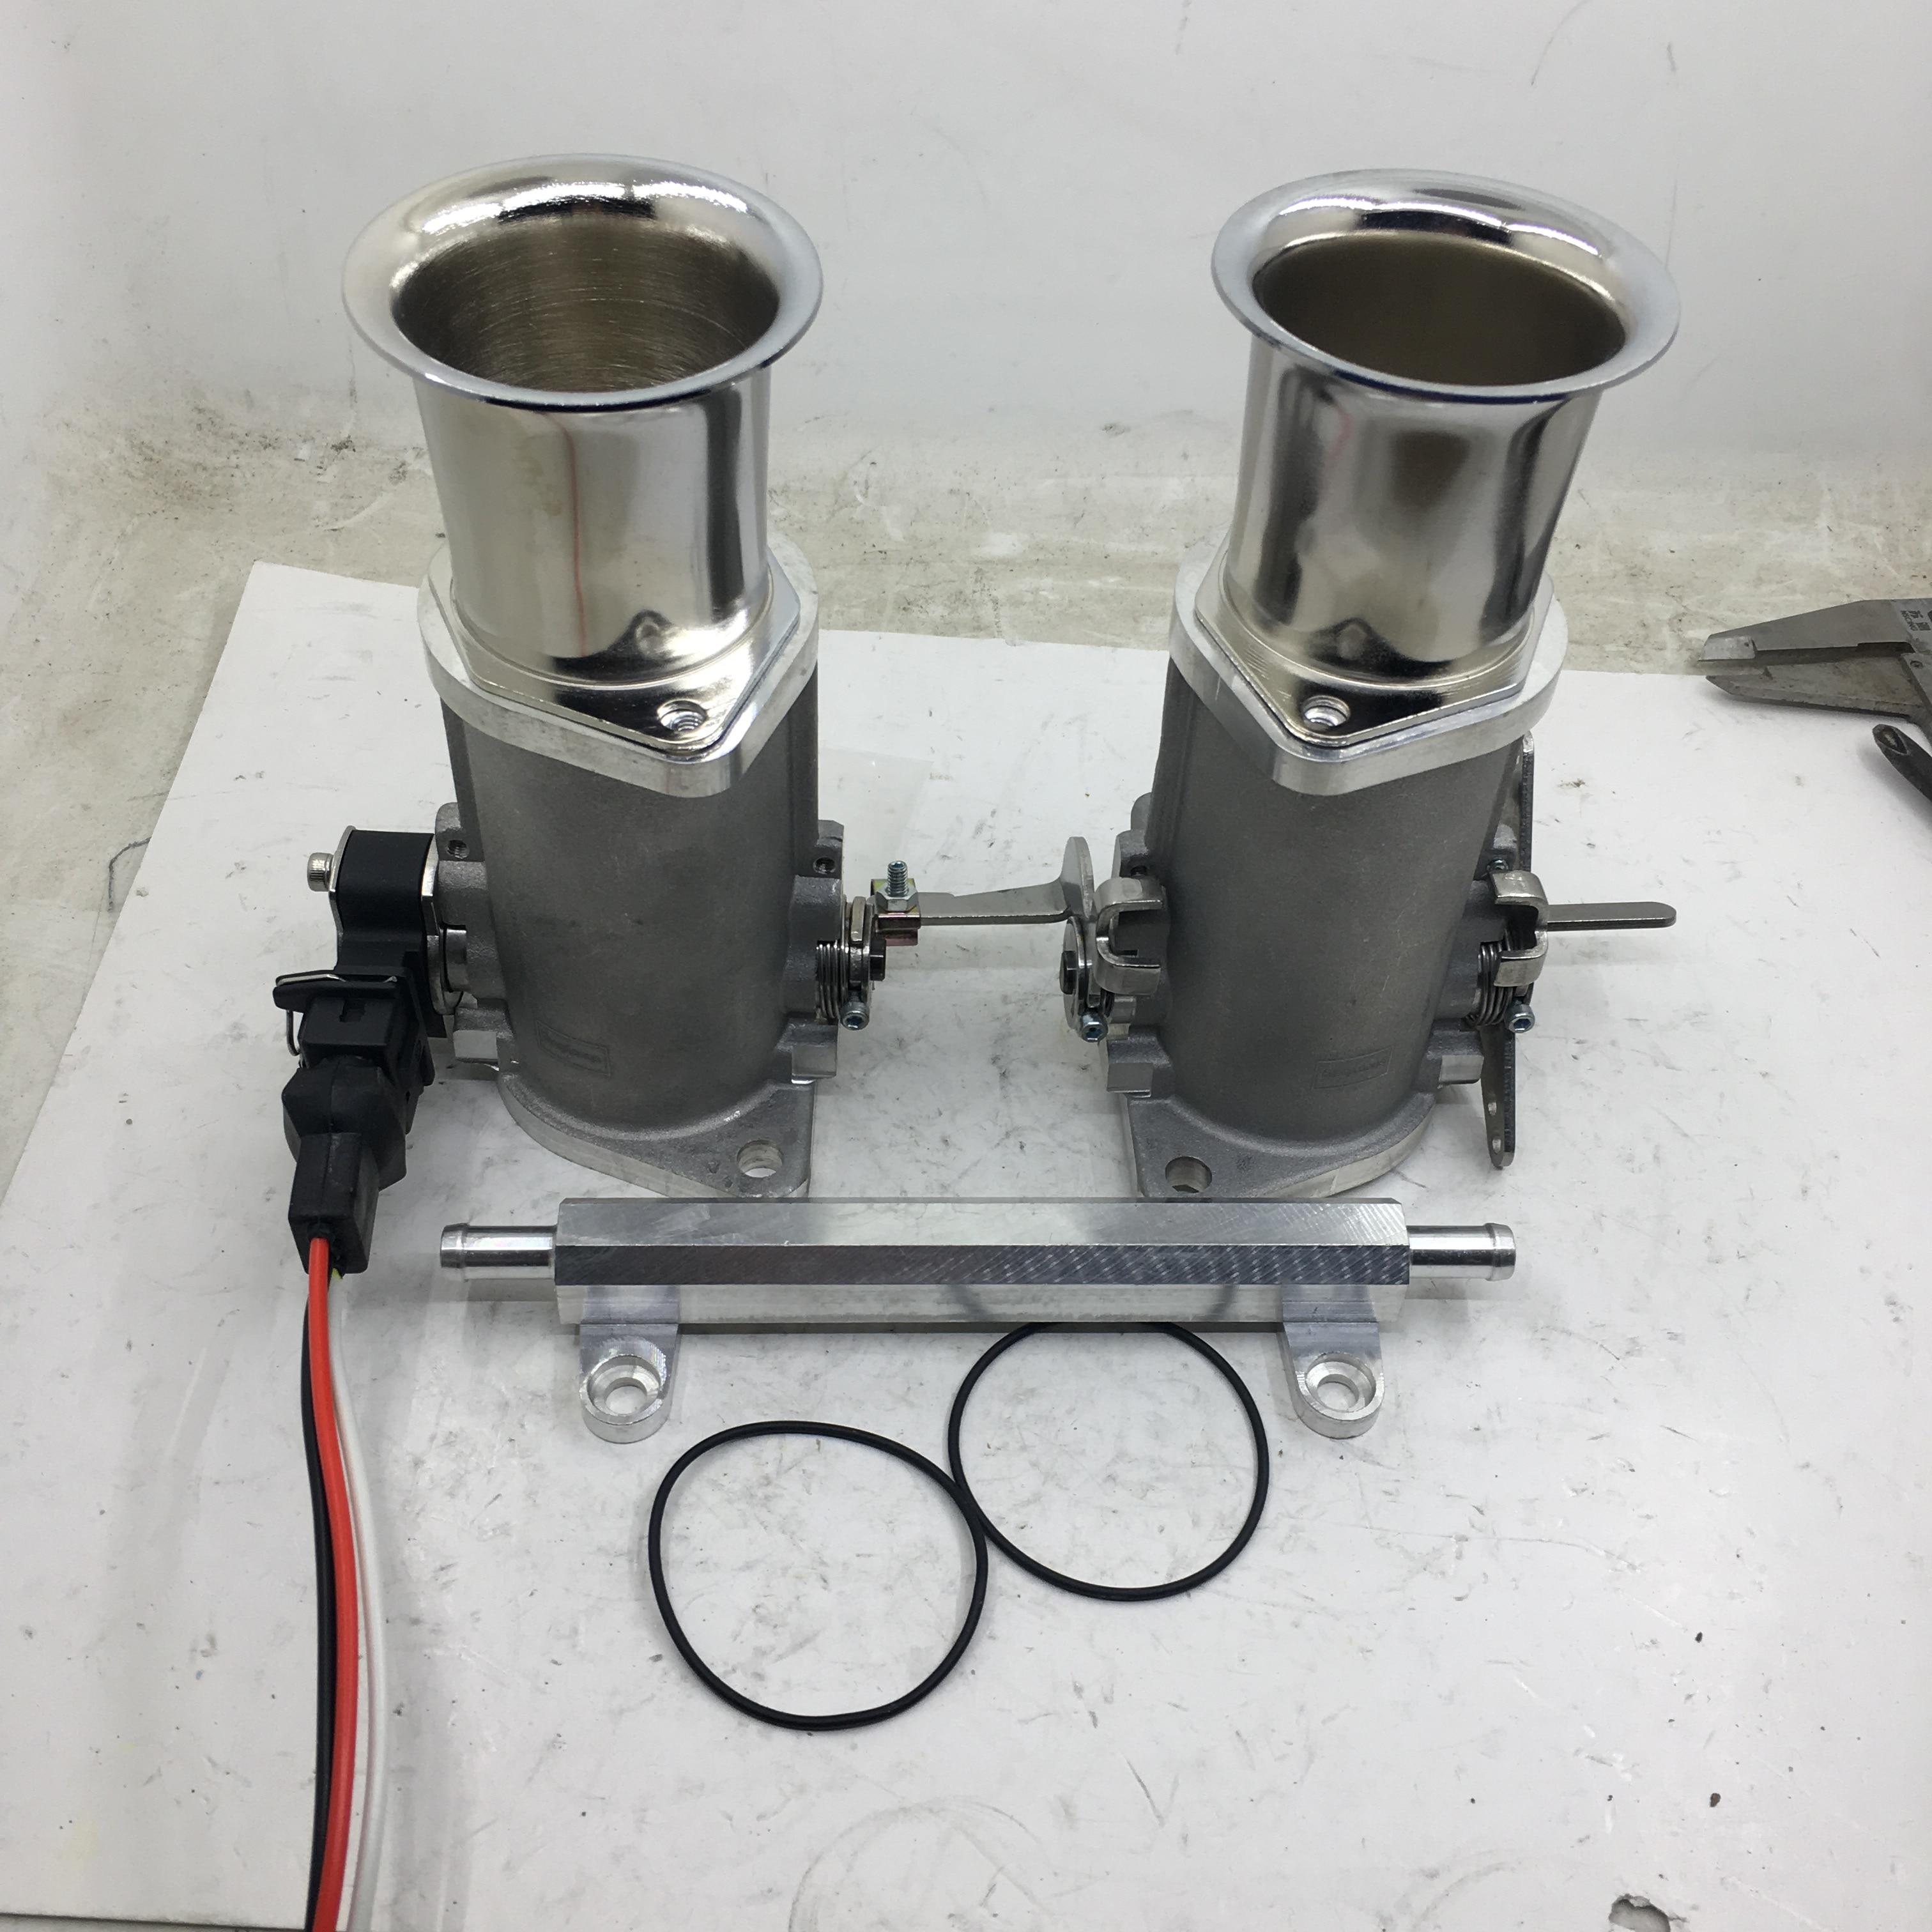 SherryBerg FAJS throttle bodies INJECTION 40IDA pattern 40mm EFI Weber FOR VW Gemini Escort Datsun with air horns TPS & cable